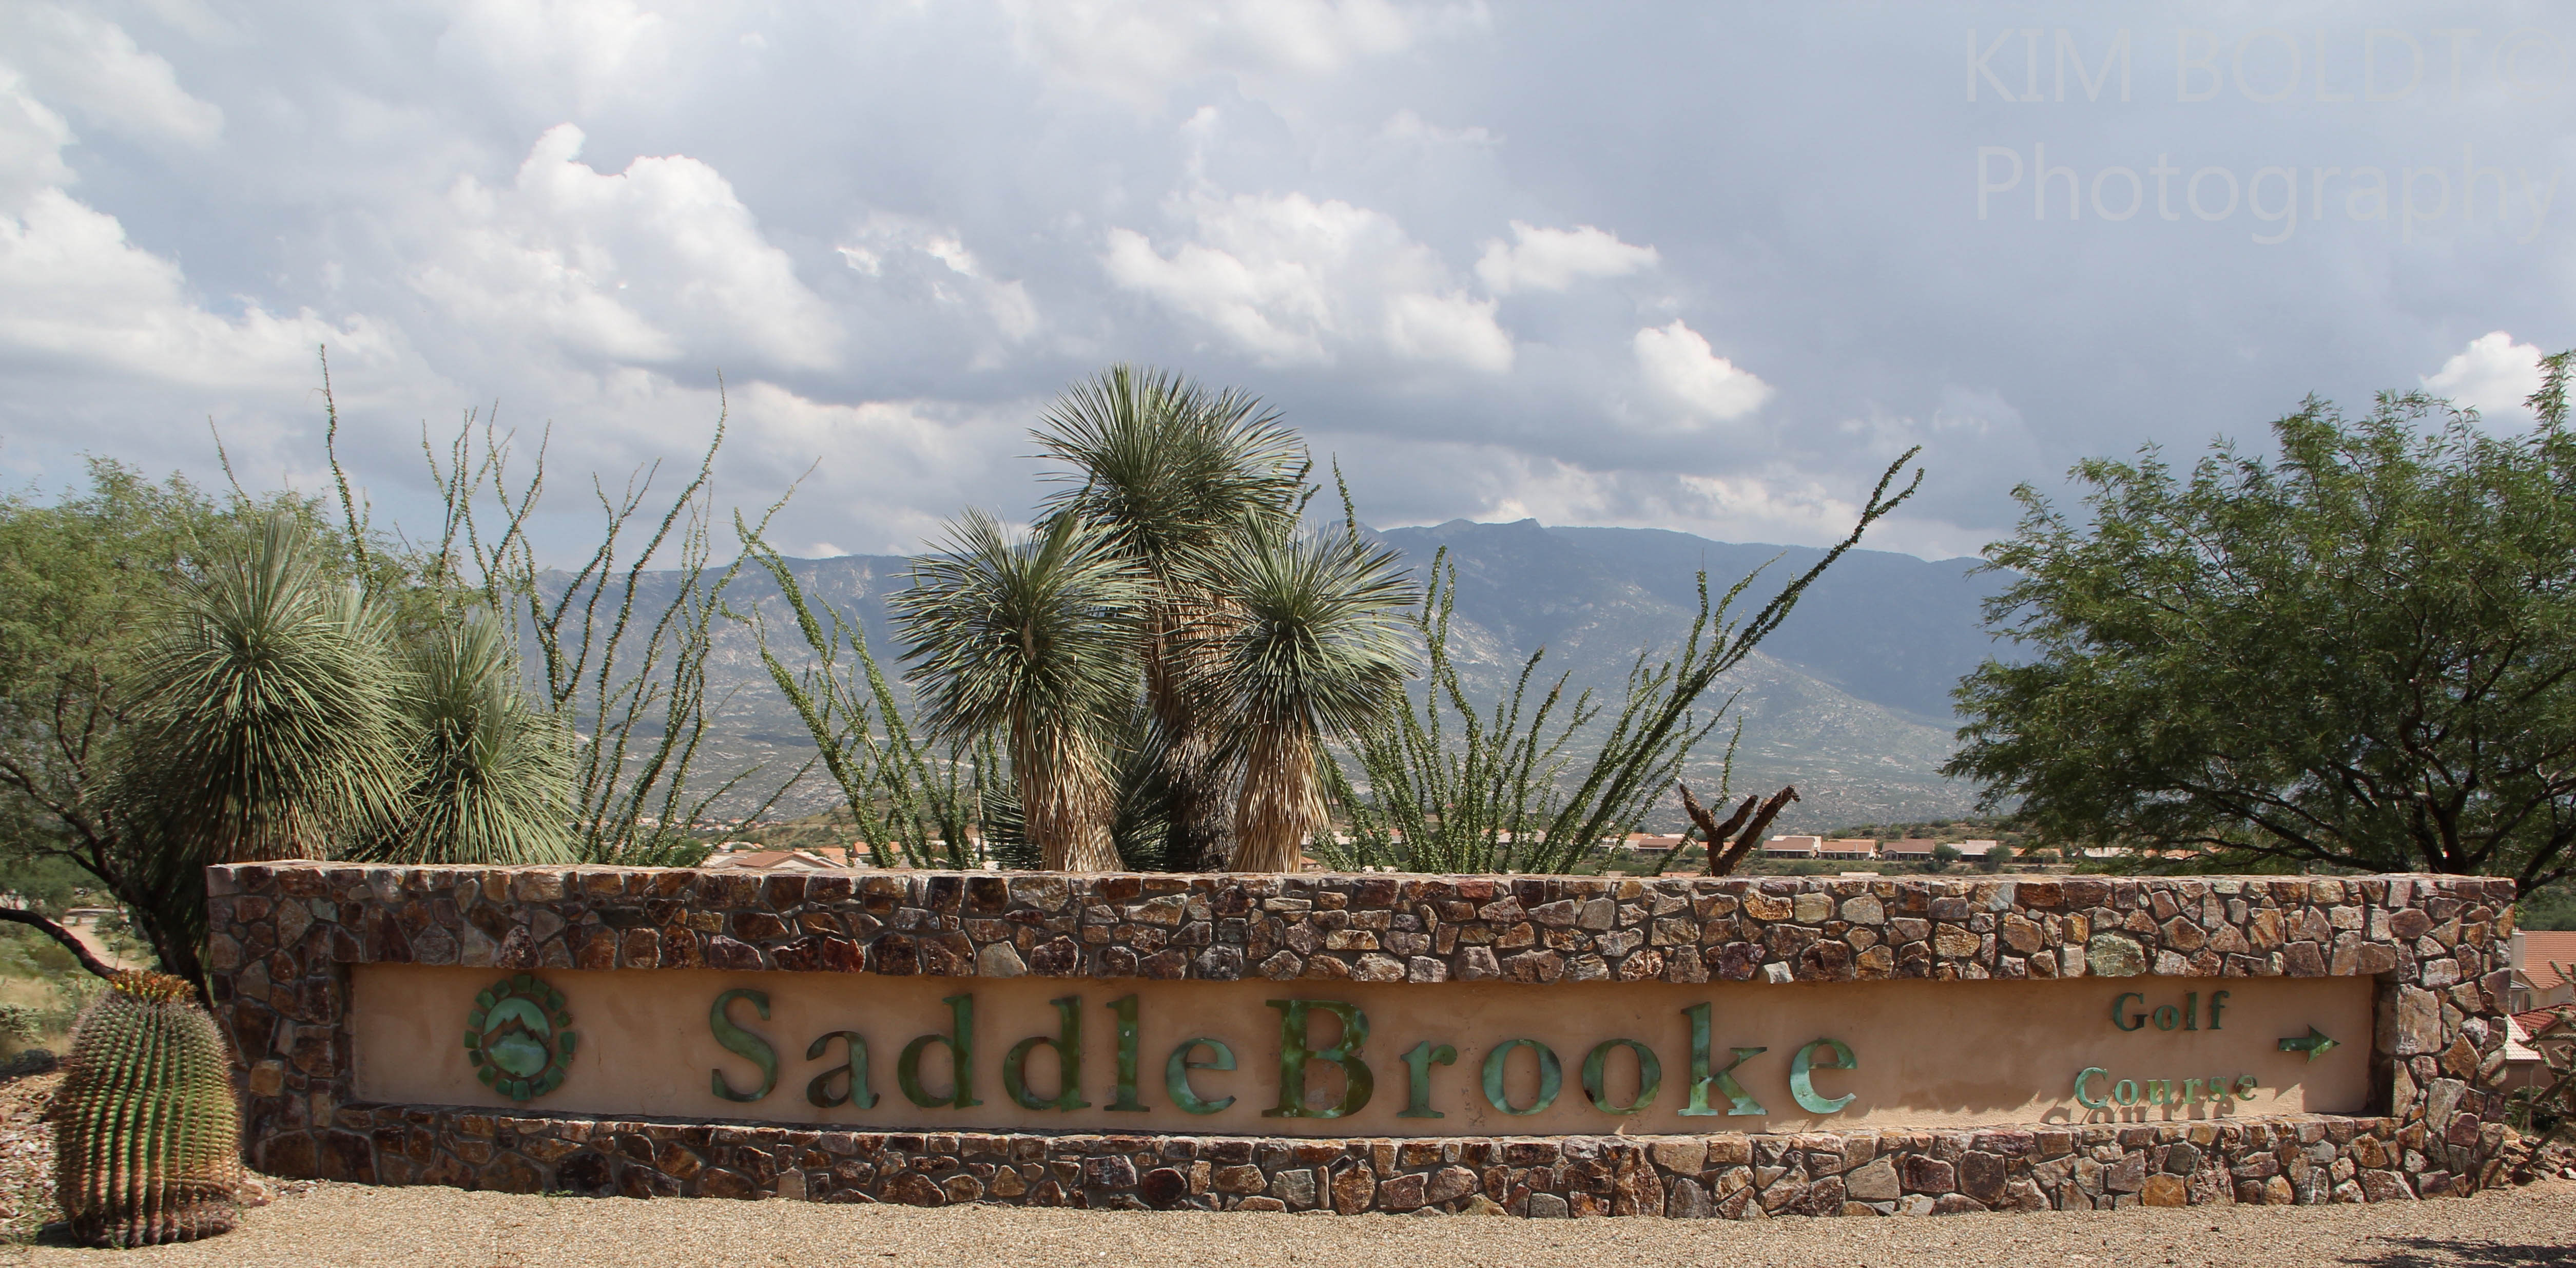 Saddlebrook is a robson community north of tucson for Saddelbrook